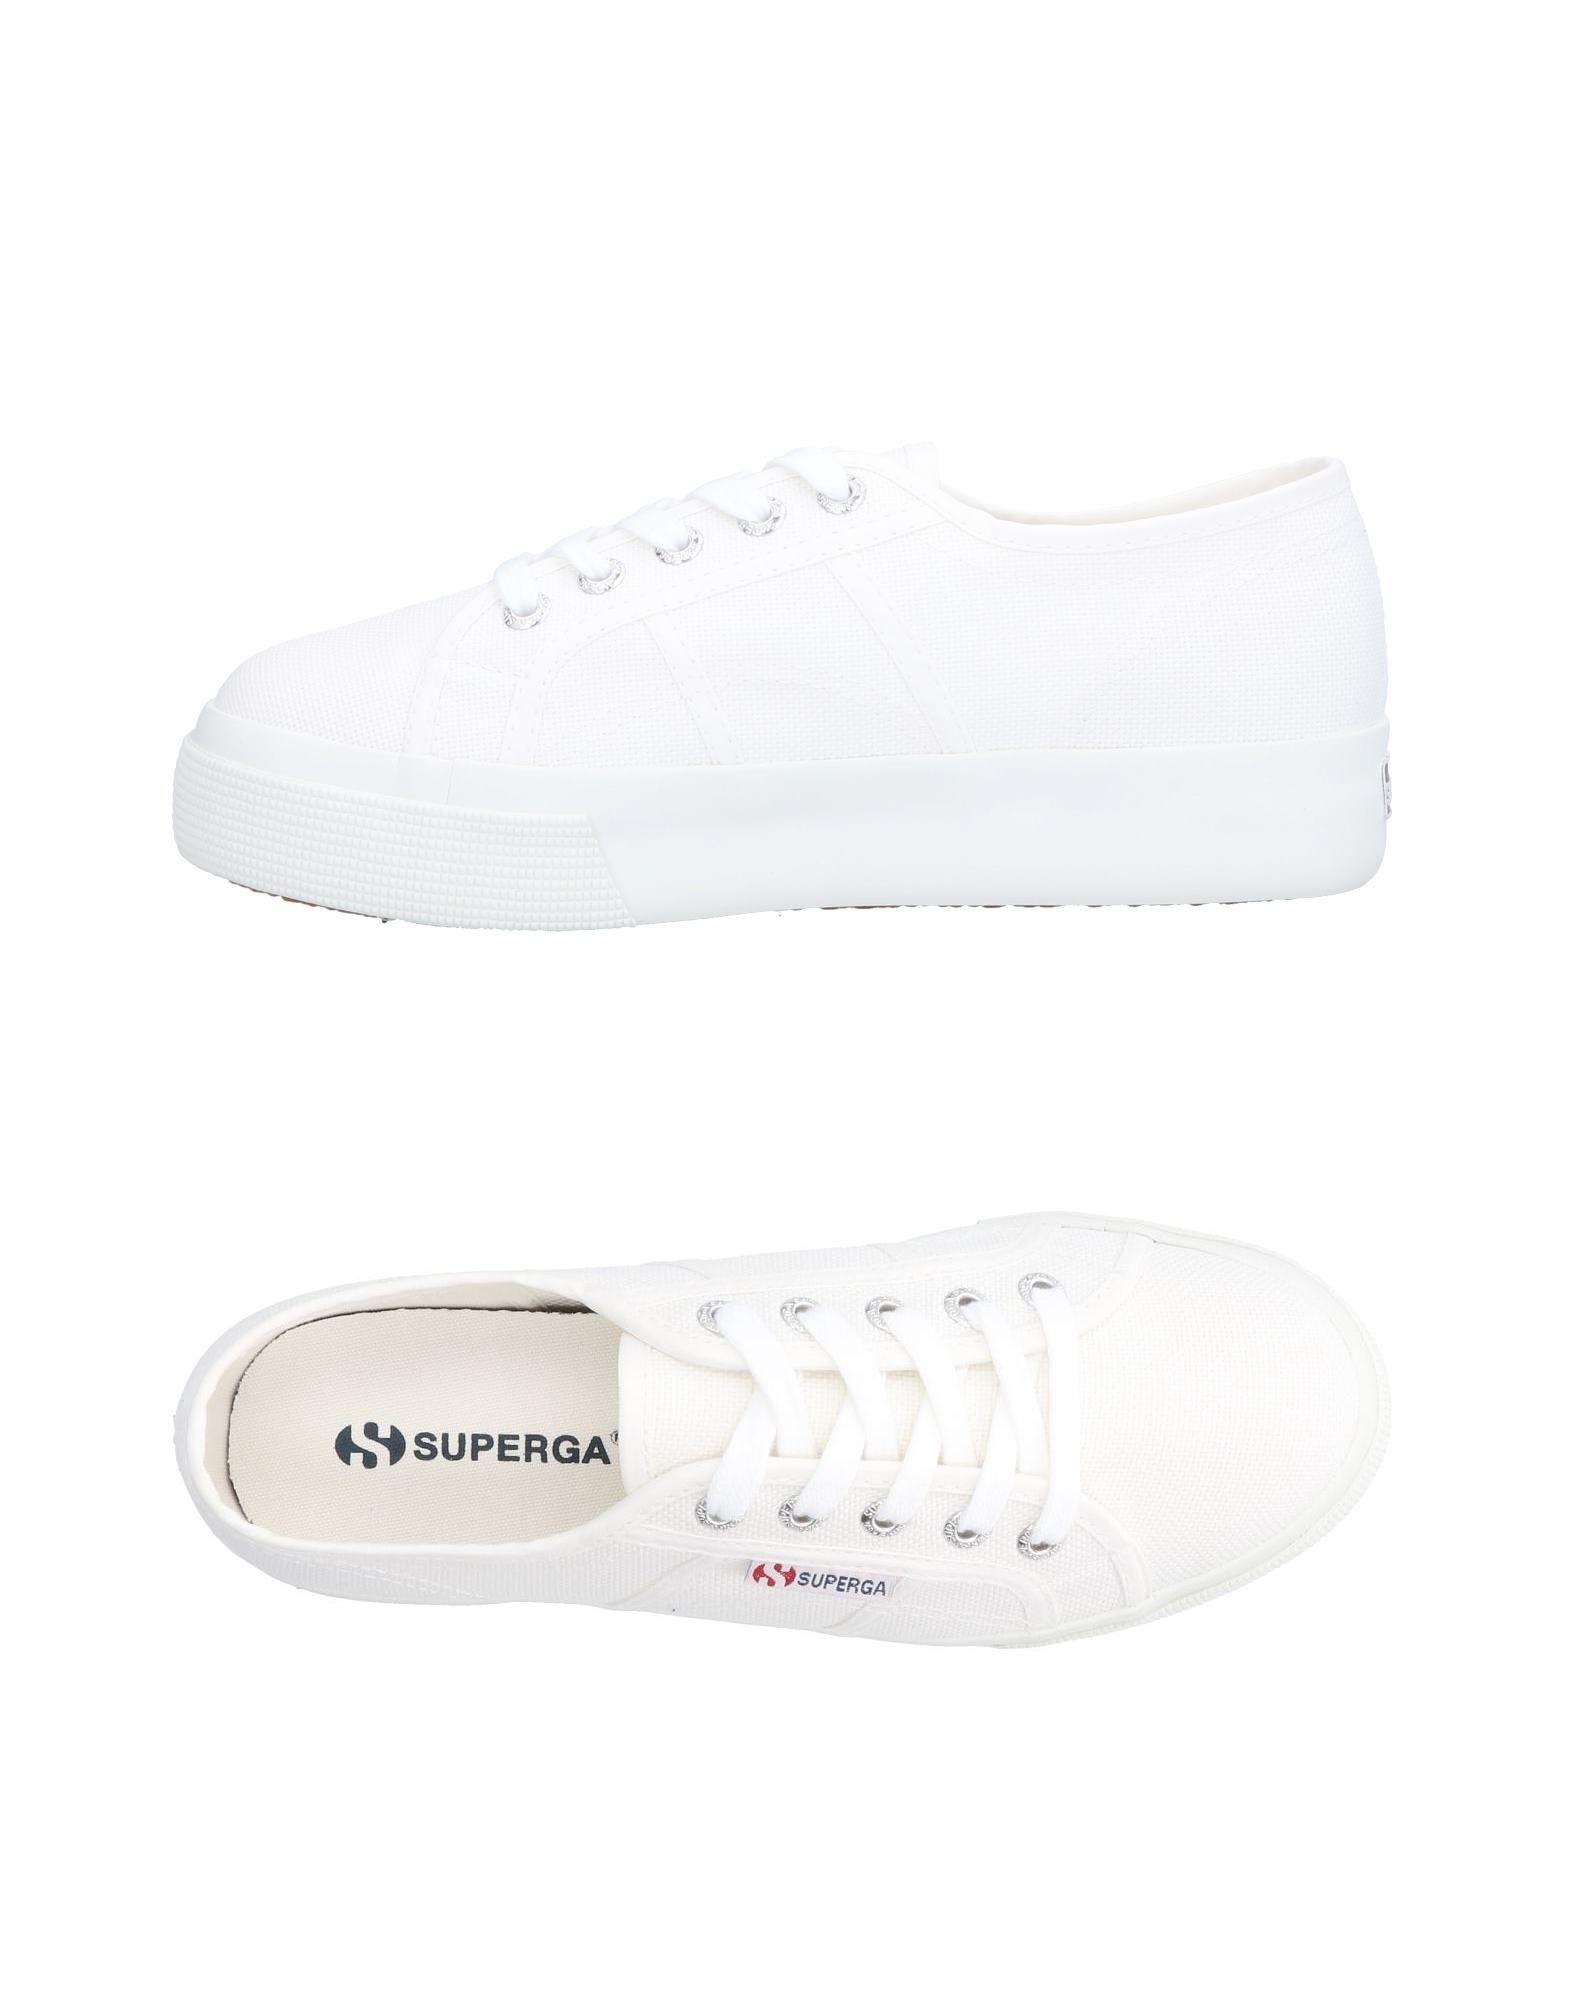 Baskets Superga® Femme - Baskets Superga® vente Blanc Meilleur modèle de vente Superga® 5bd516